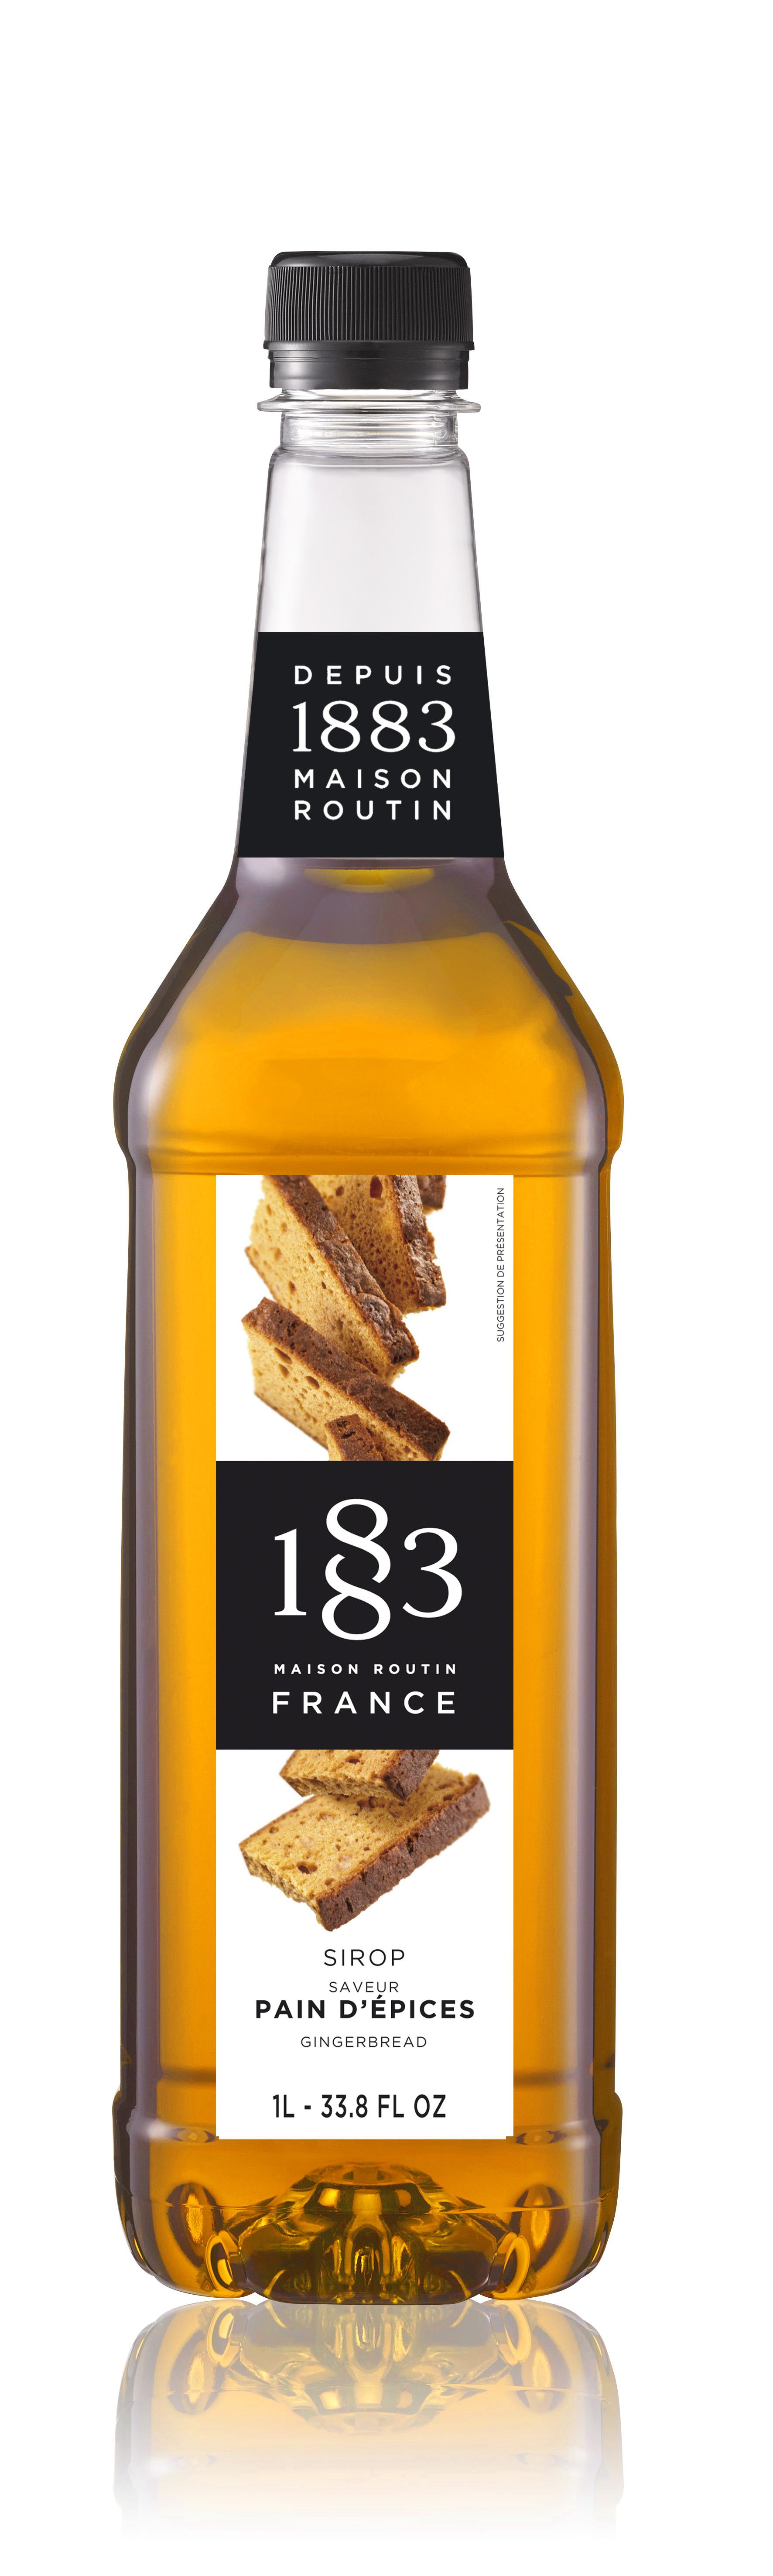 1883 Syrup Gingerbread 1L PET Plastic Bottle